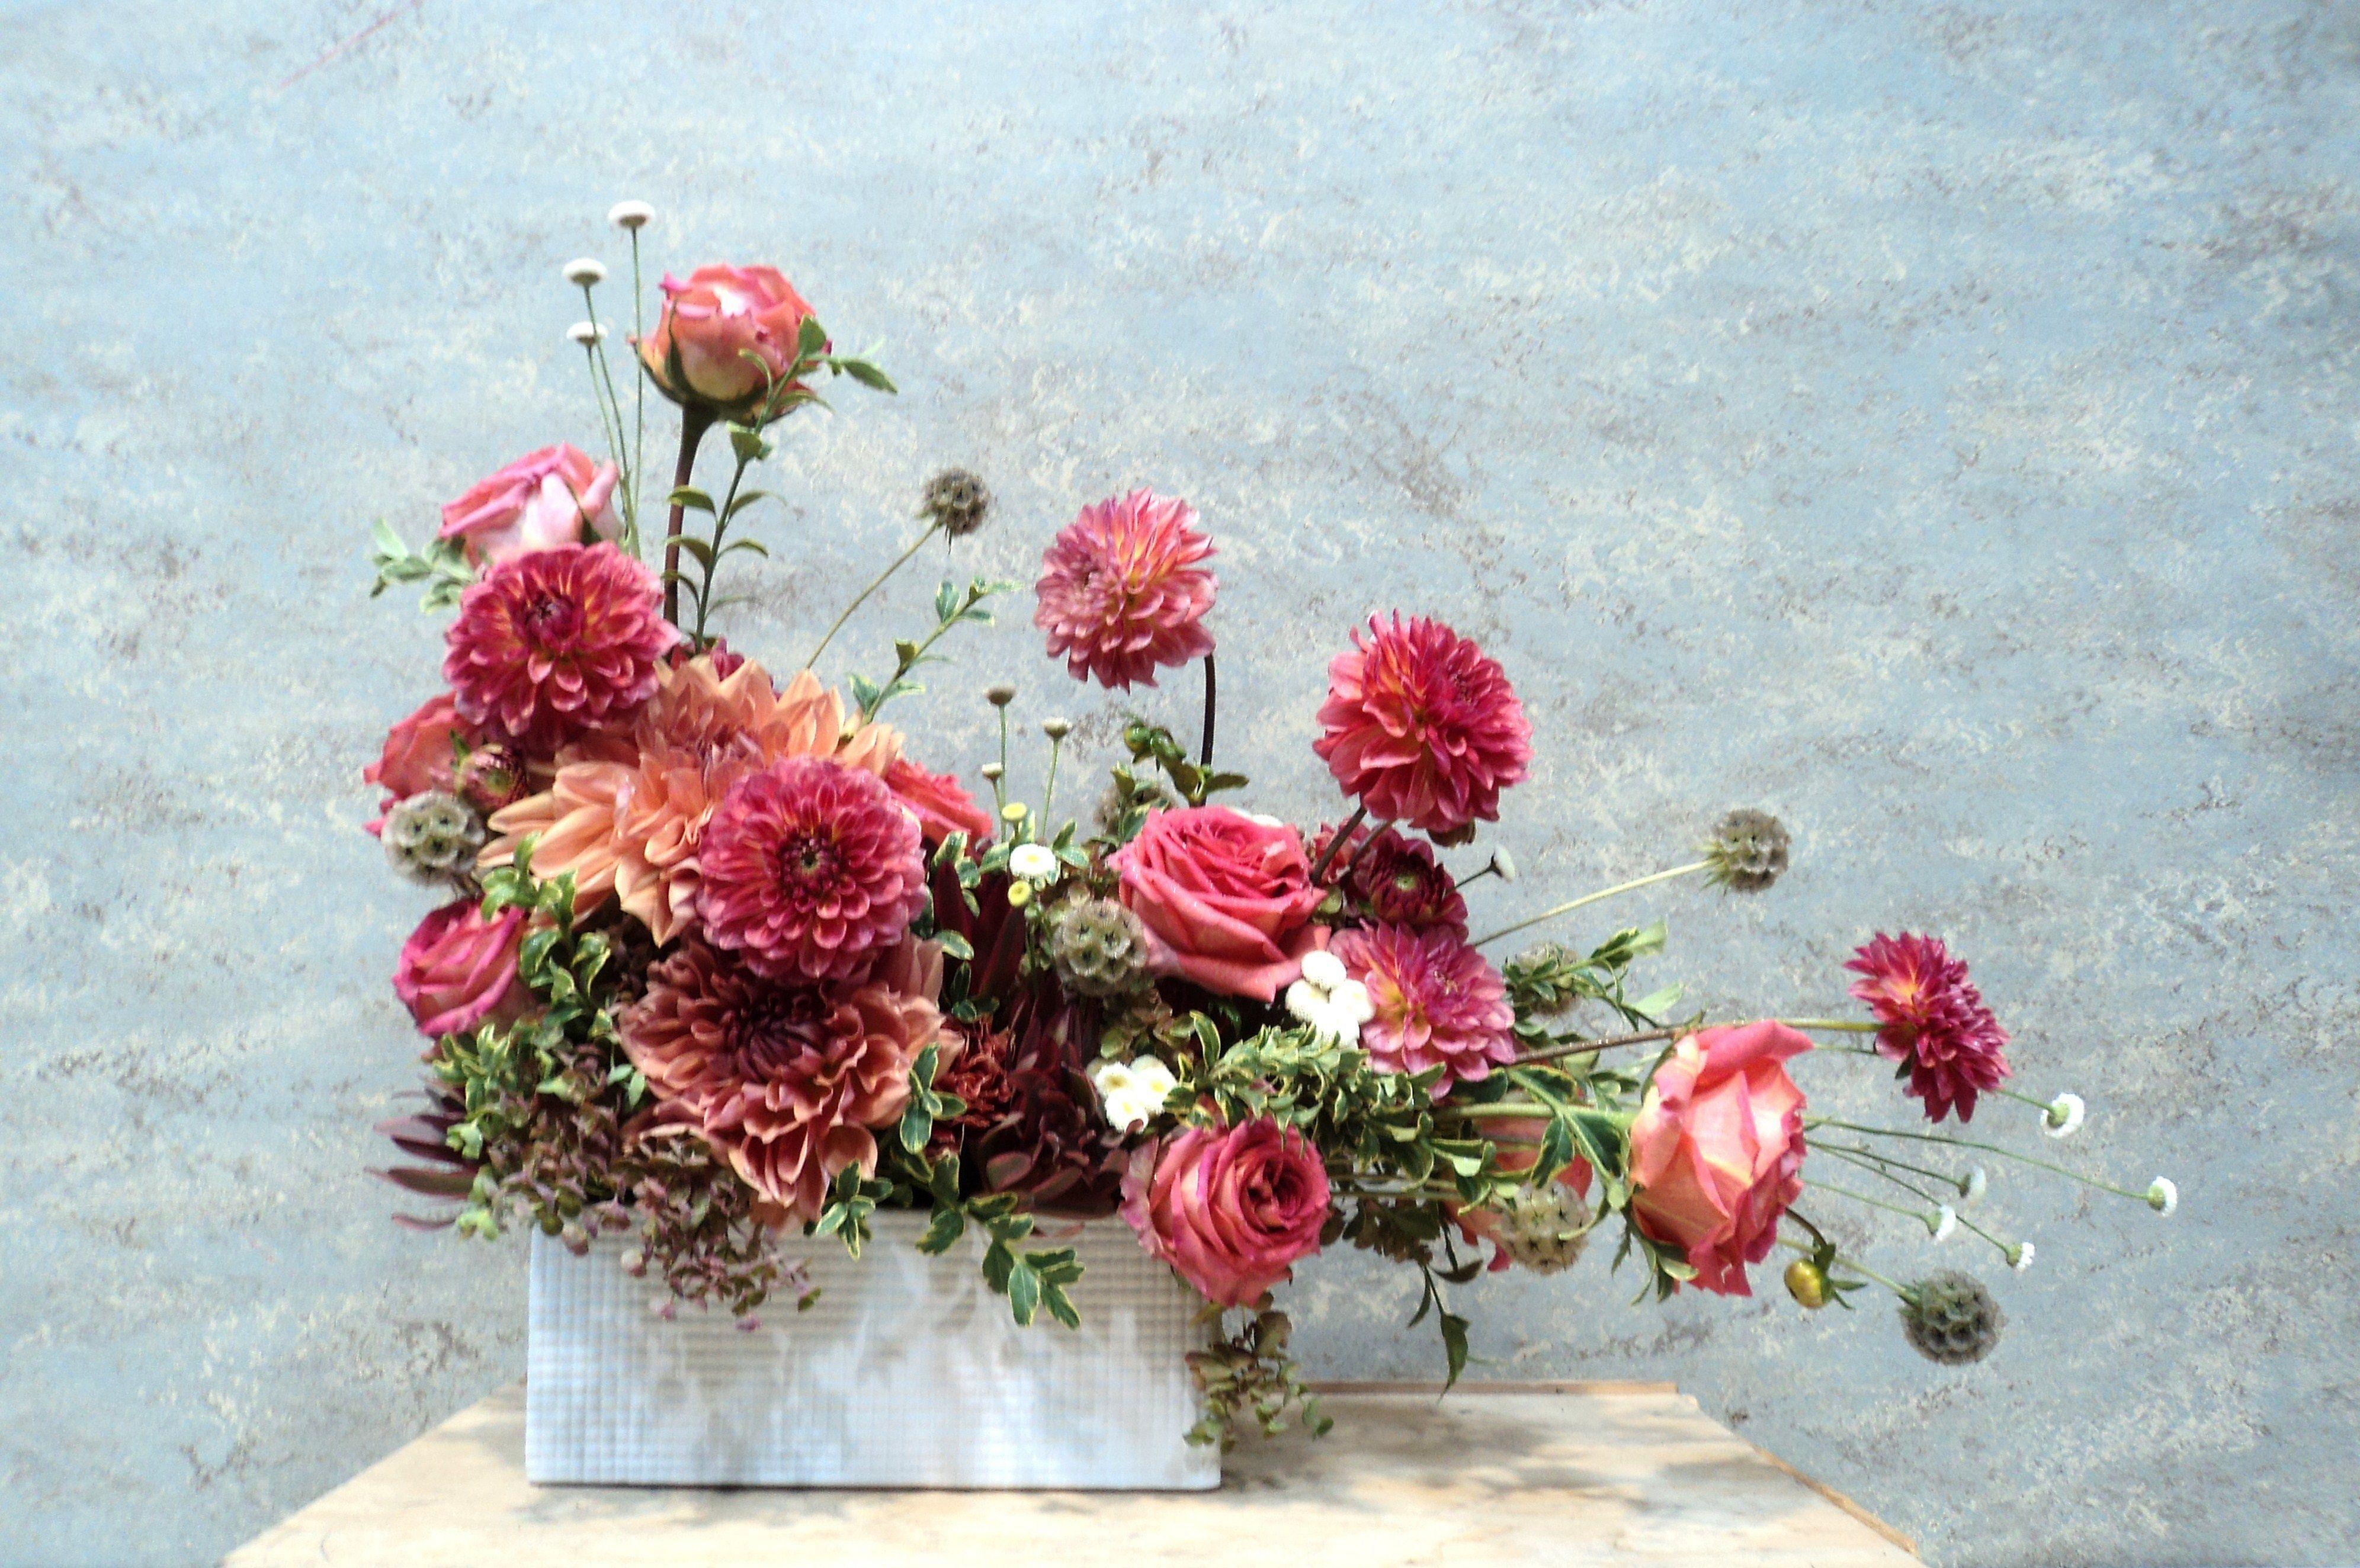 35 Beautiful Valentine Floral Arrangements Ideas For Your Beloved